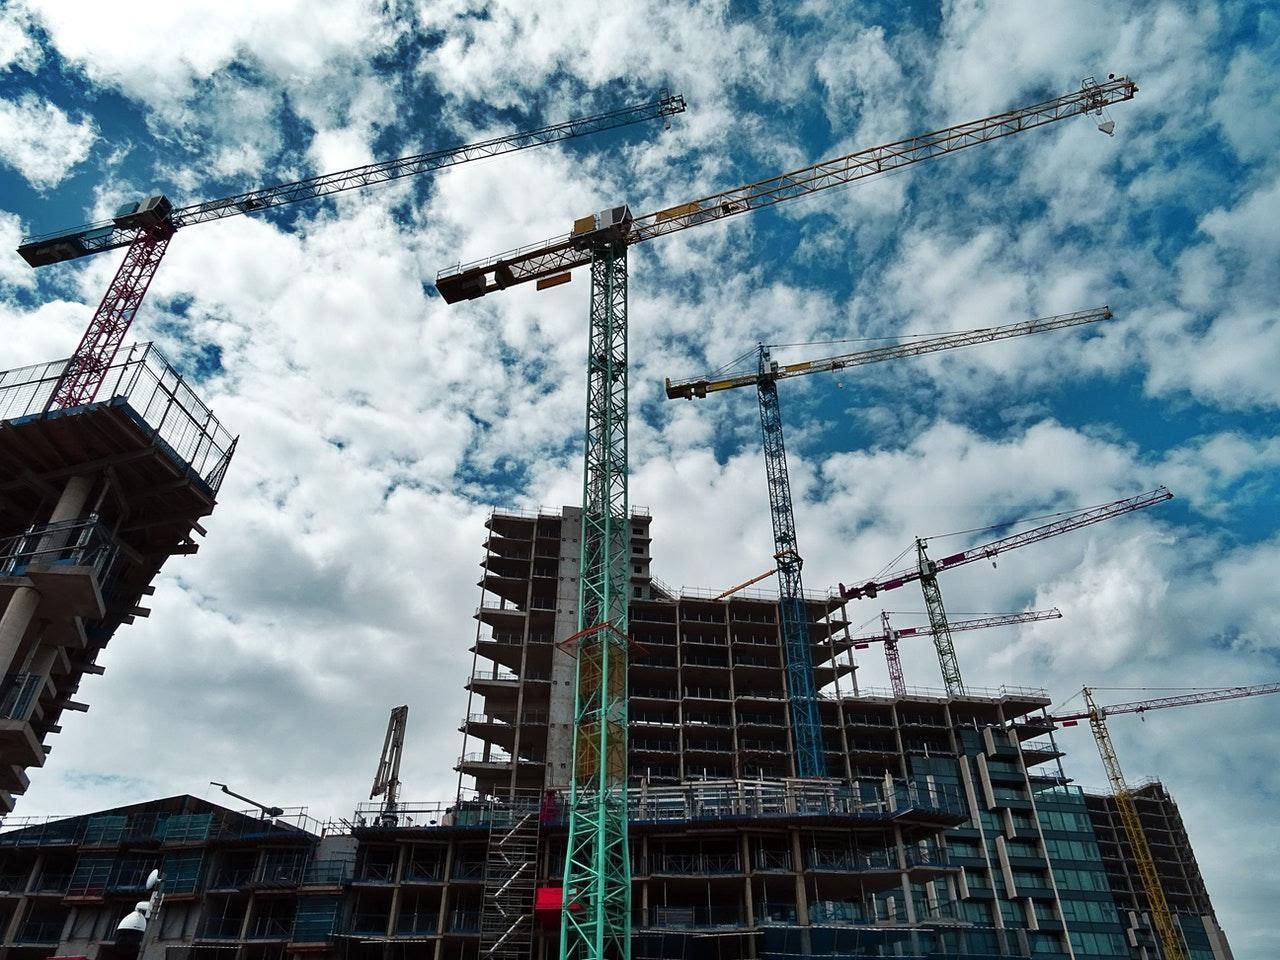 Industrial Tower Cranes